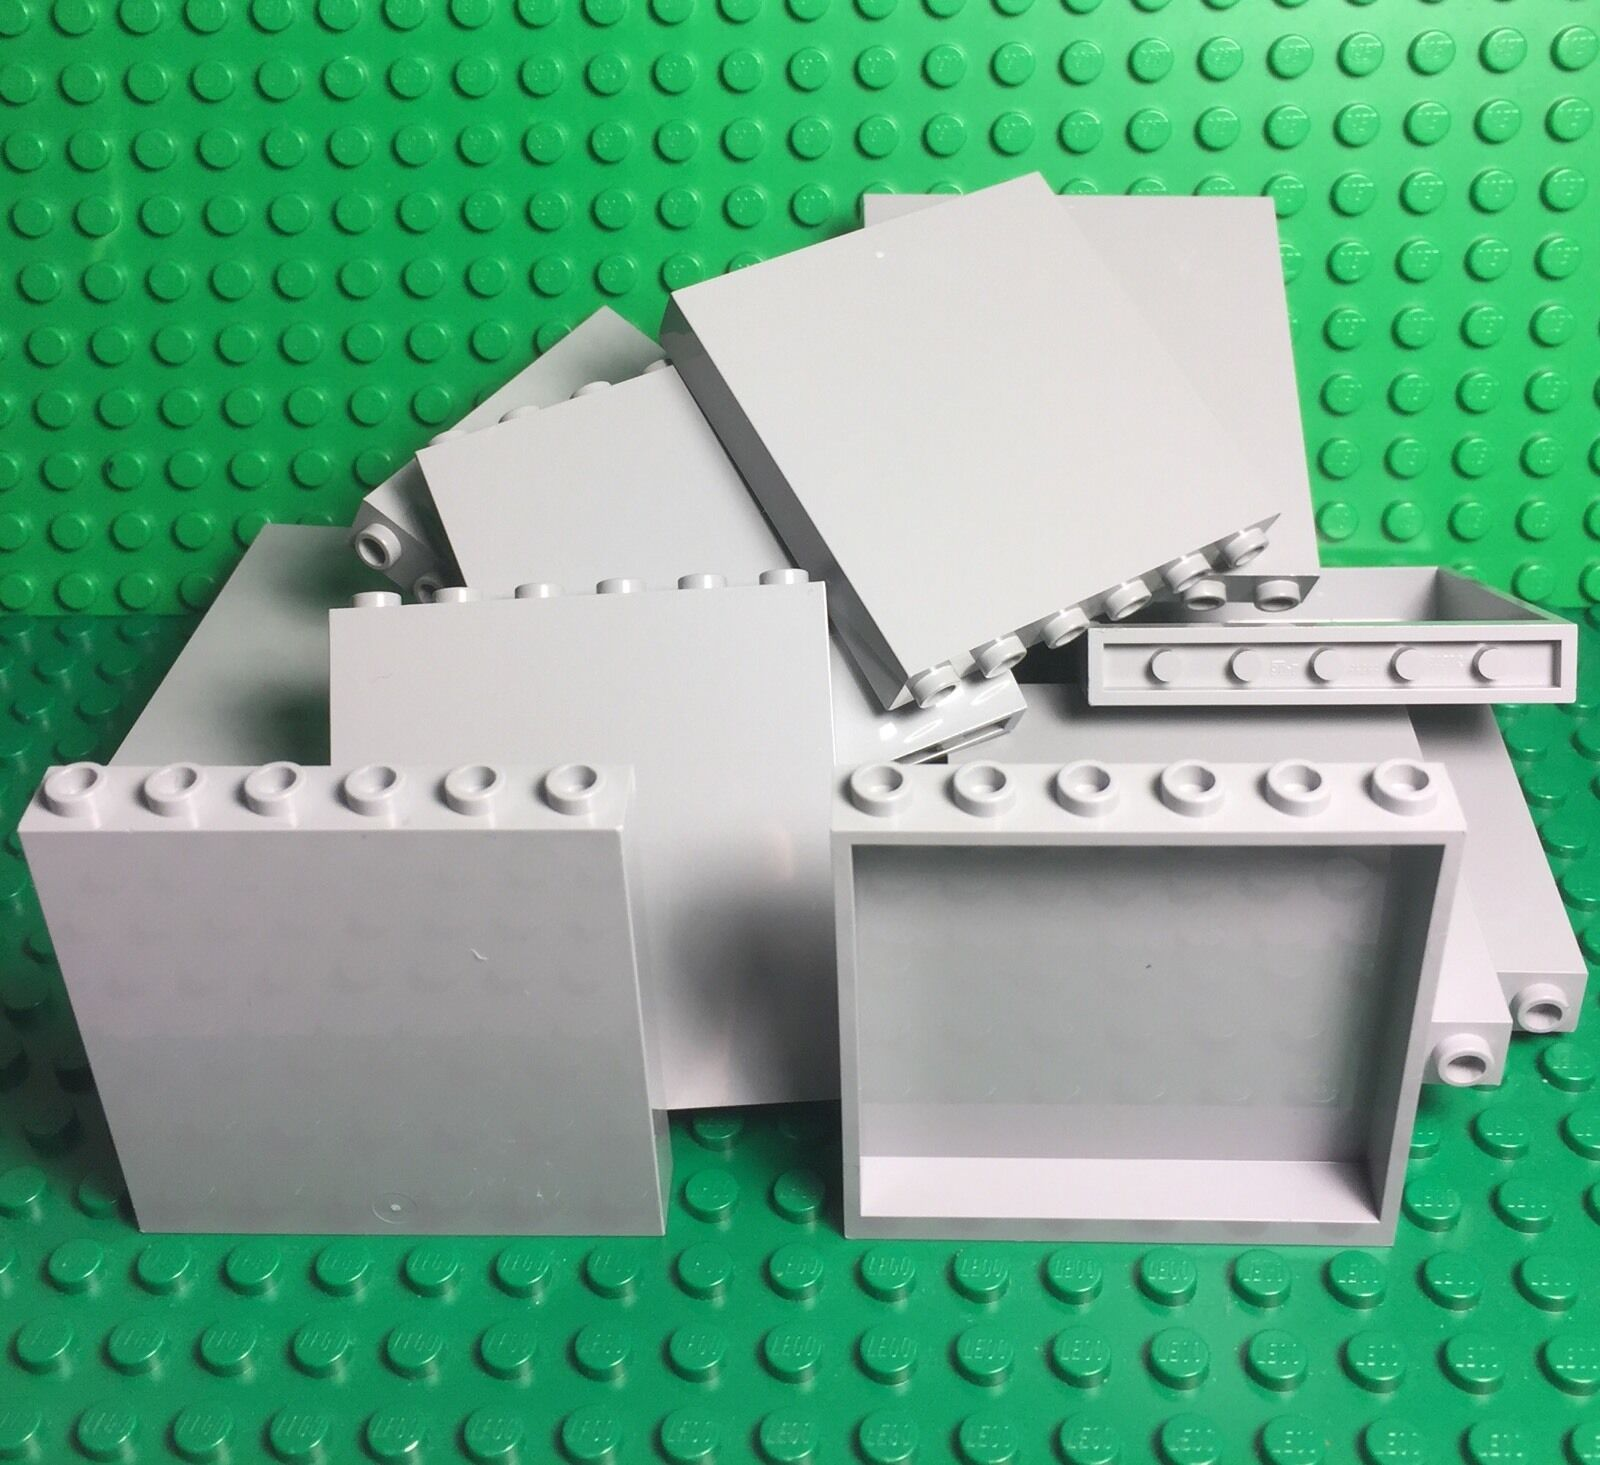 Lego X50 Bulk Light Bluish Gris 1x6x5 Panel / Medium Stone Gris Wall Parts Lot